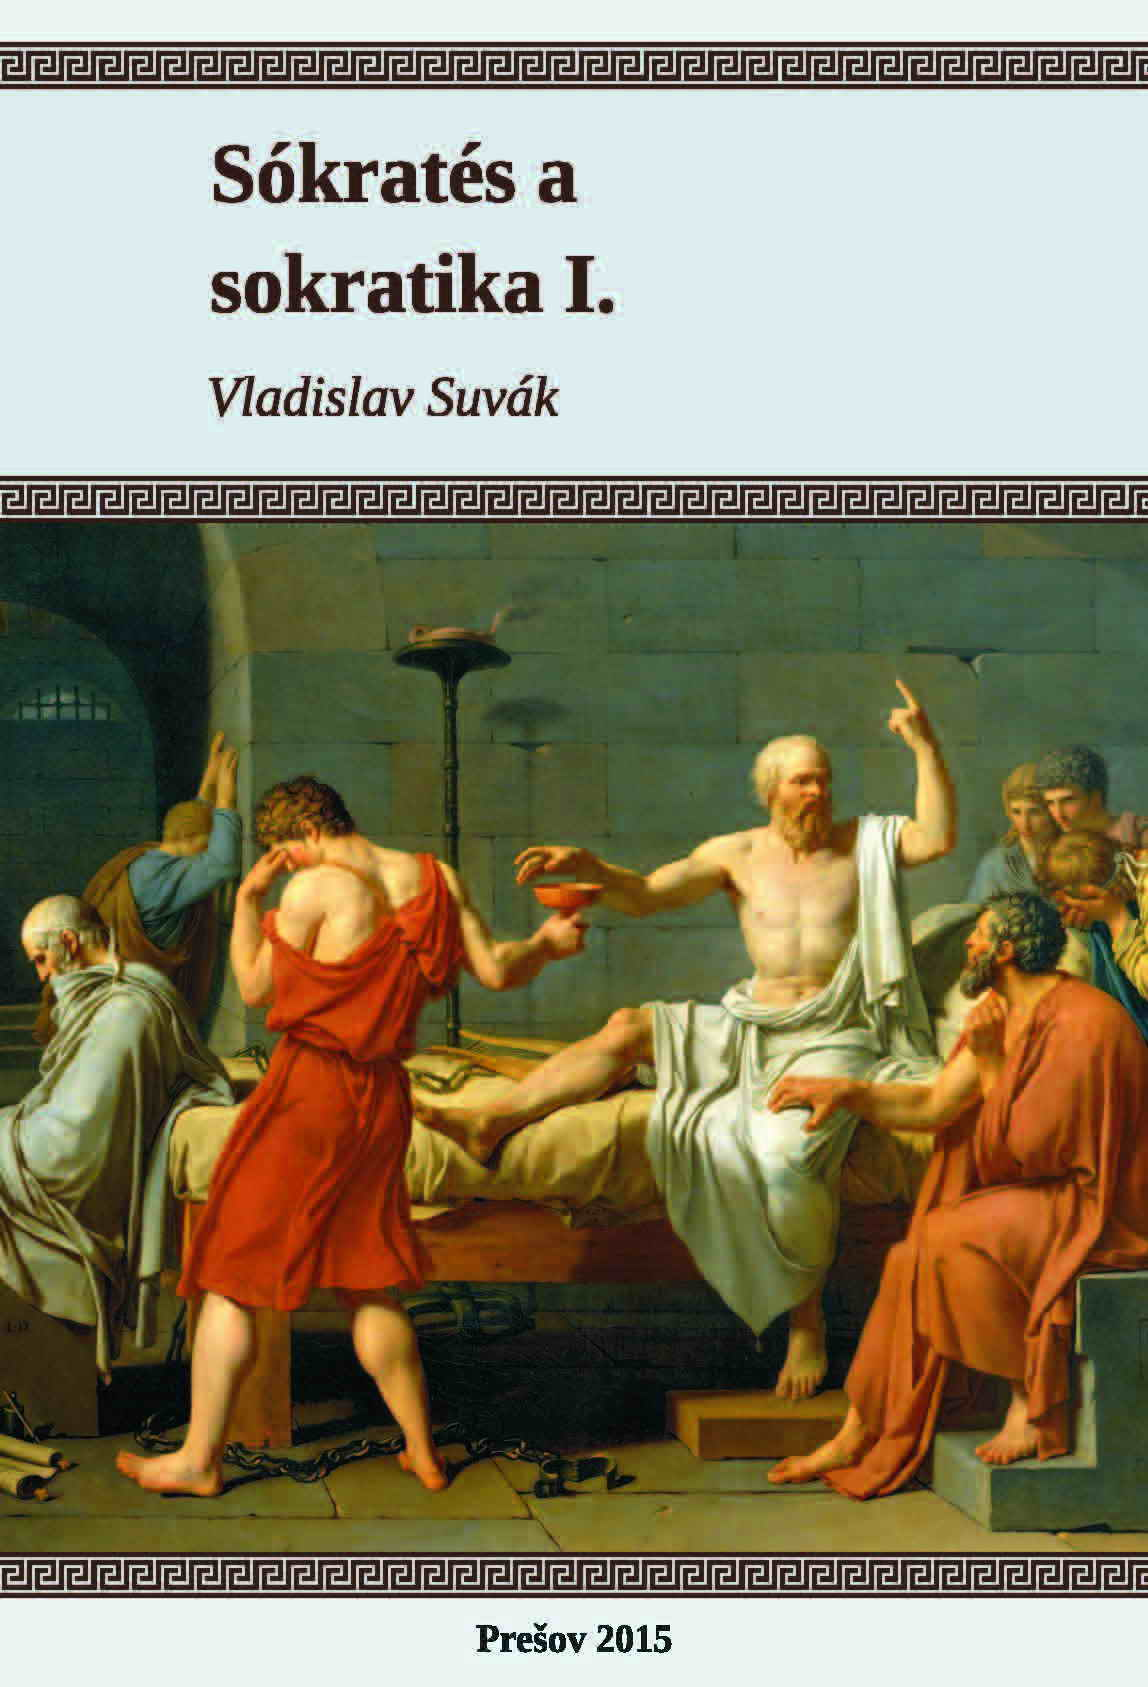 Sokrates a sokratika 2015_cover